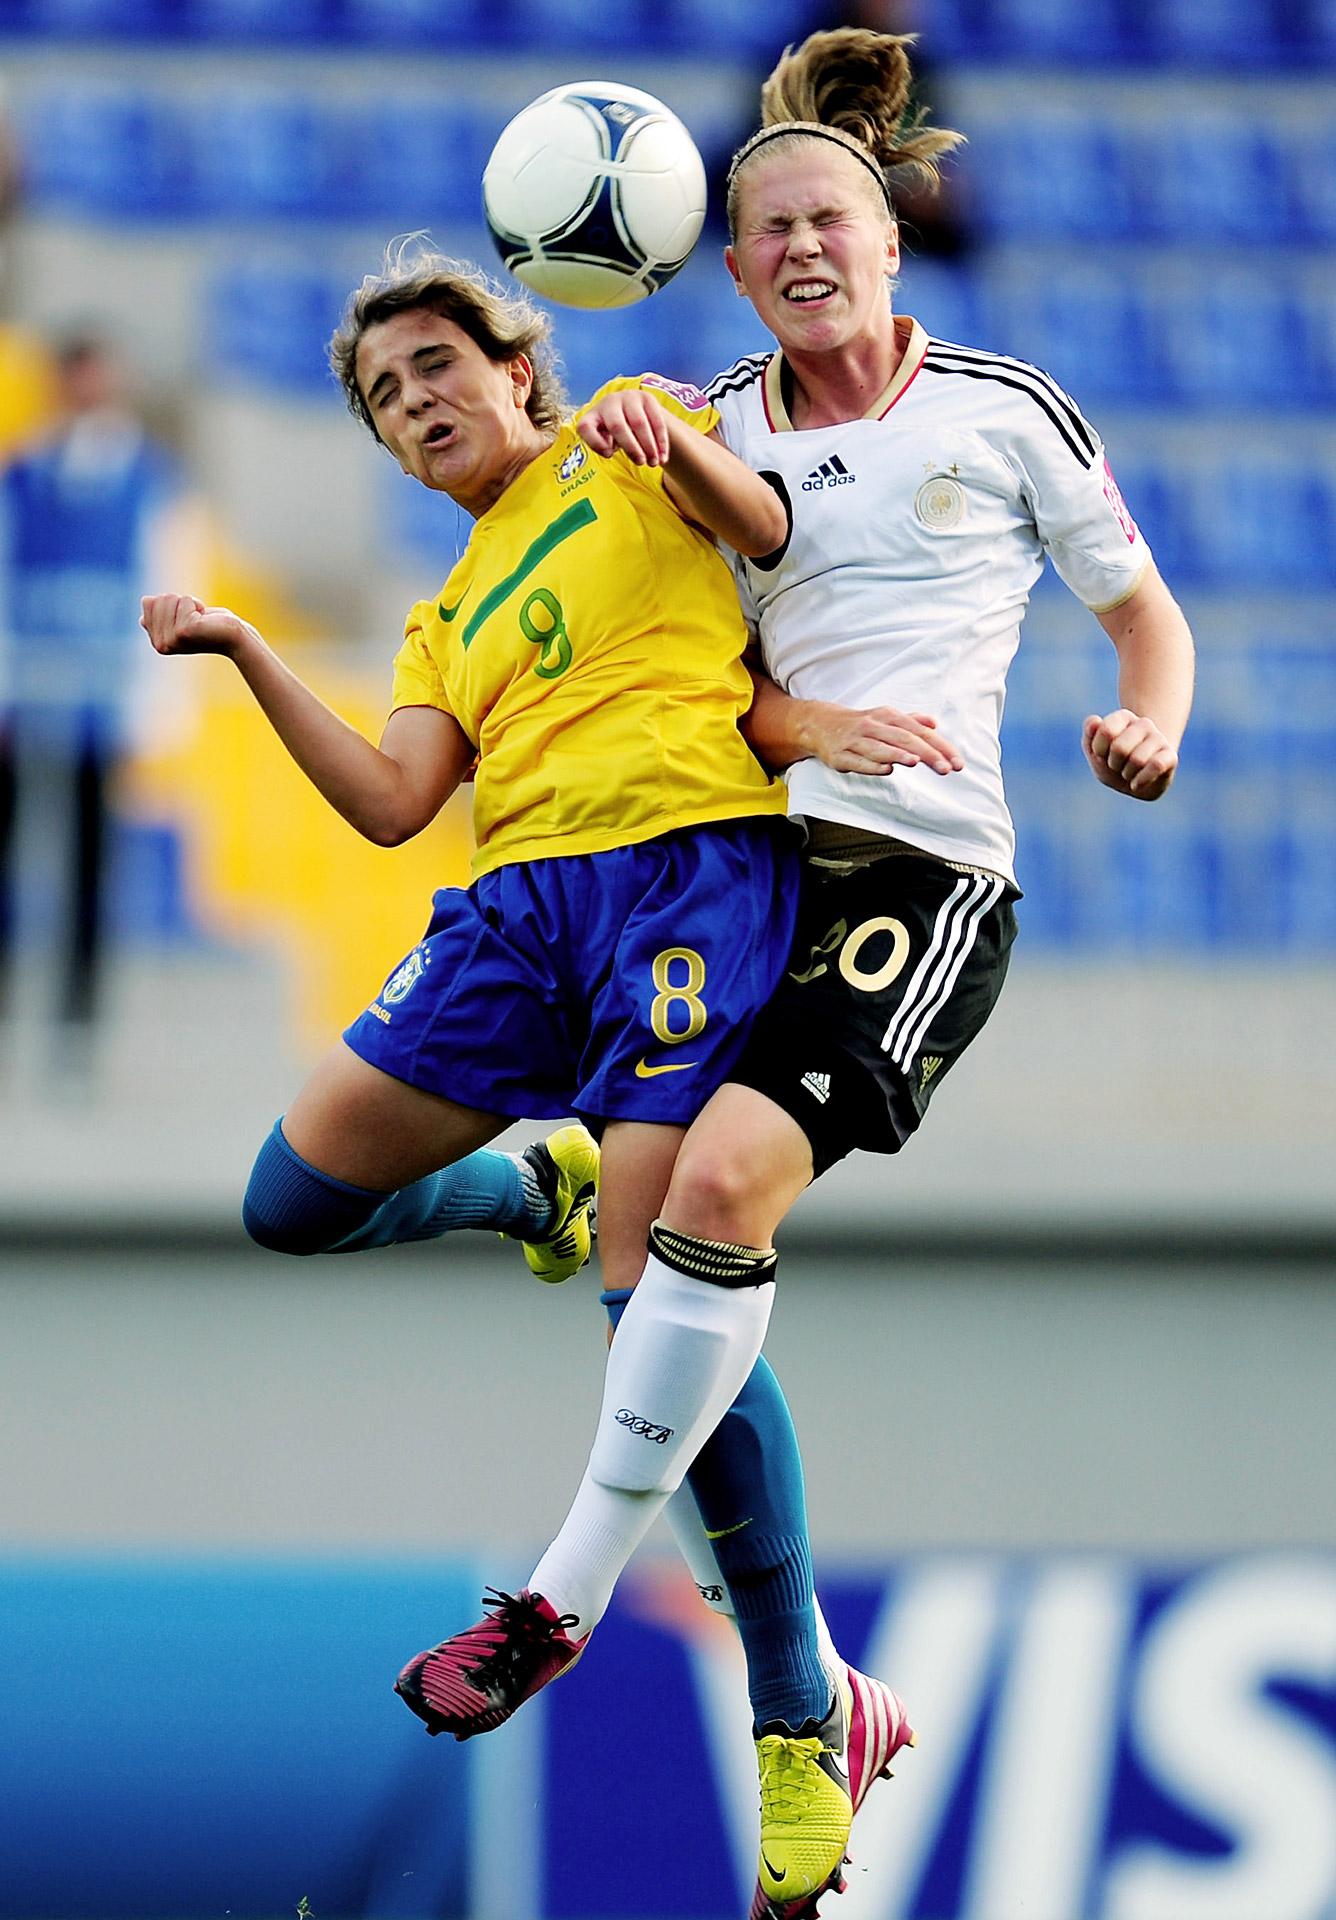 U-17 Germany and Brazil